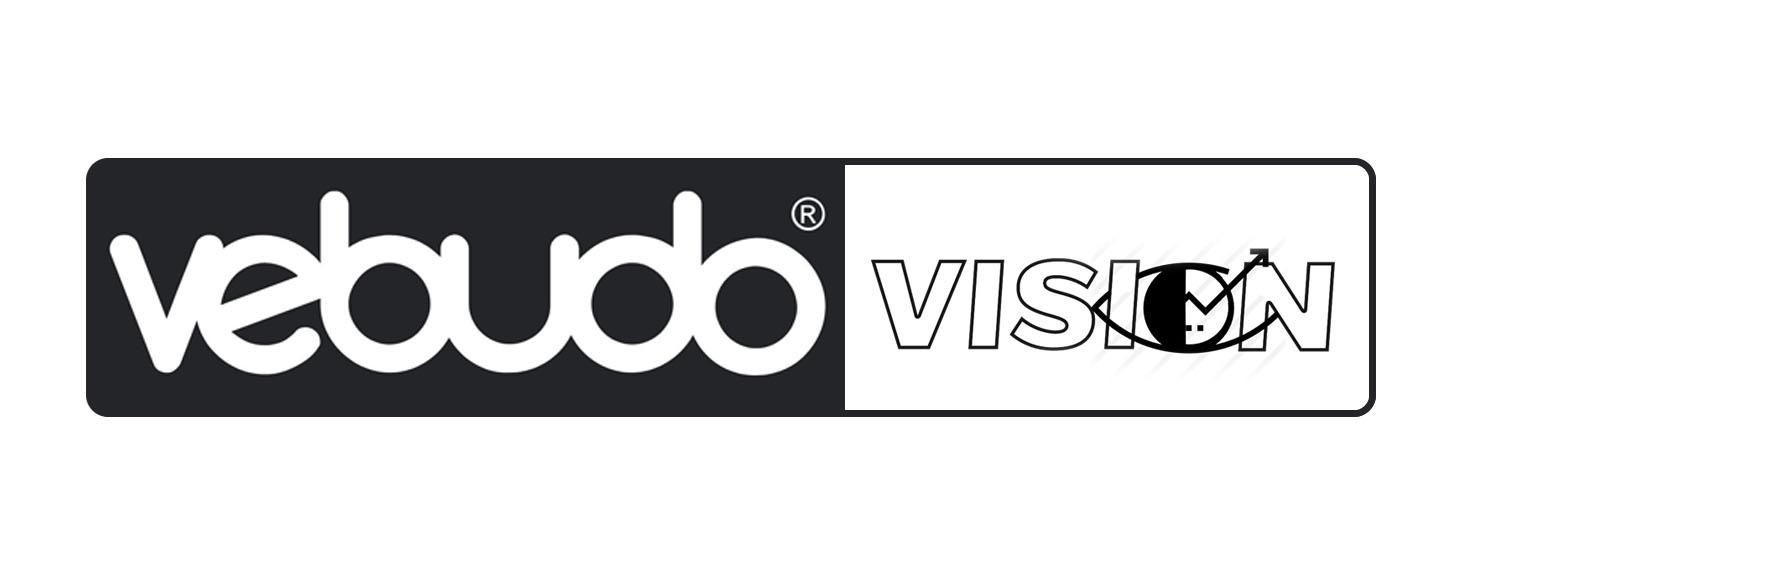 Vebudo Vision